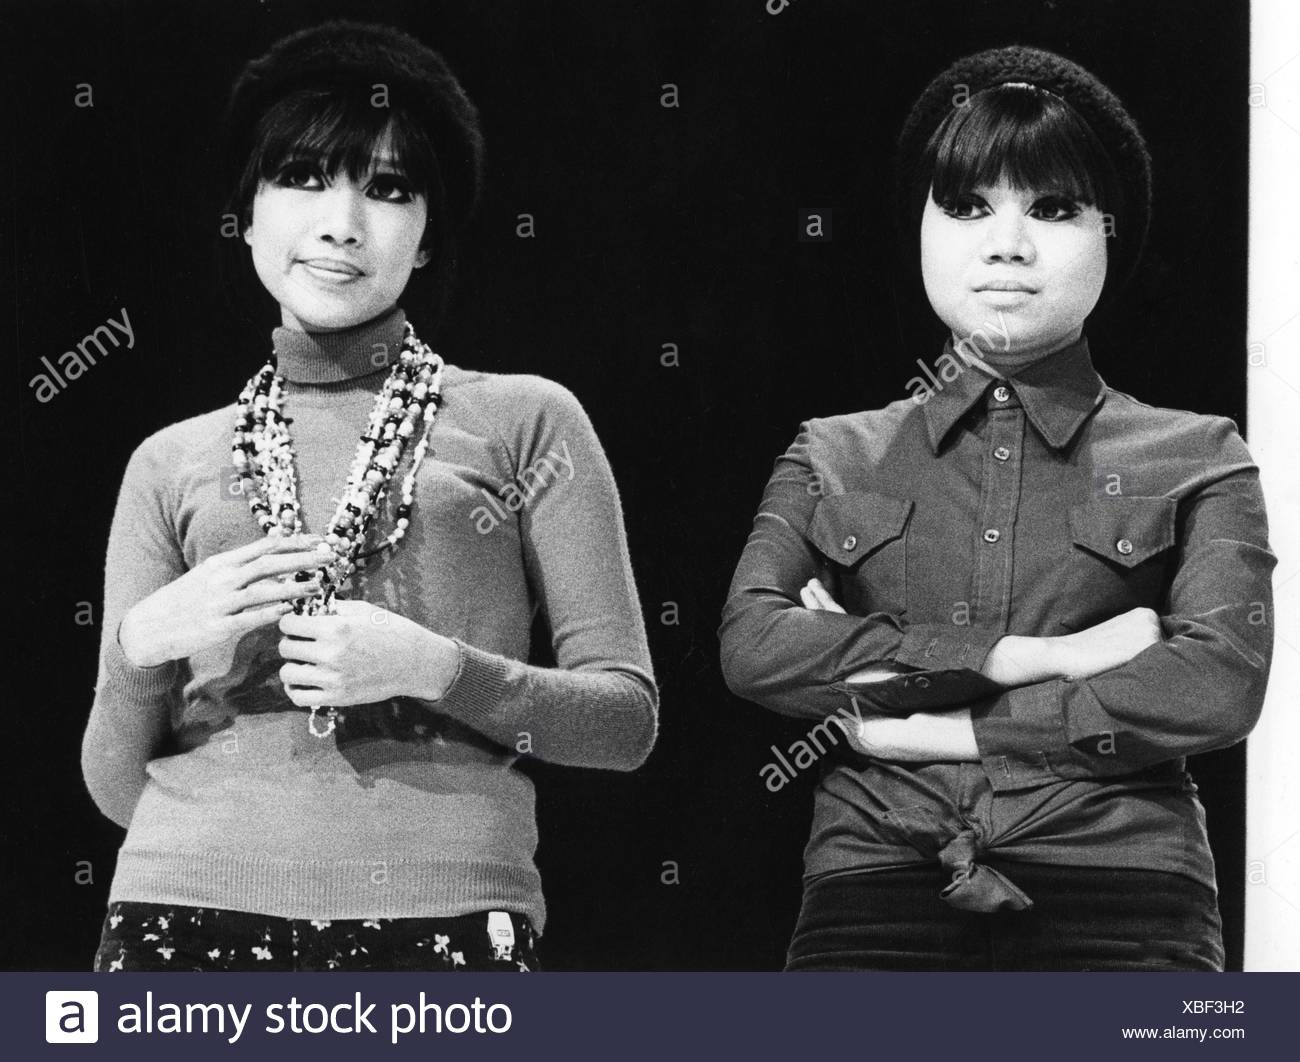 Les Humphries Singers, Popmusikband, zwei linke Sänger, 1972, Stockfoto